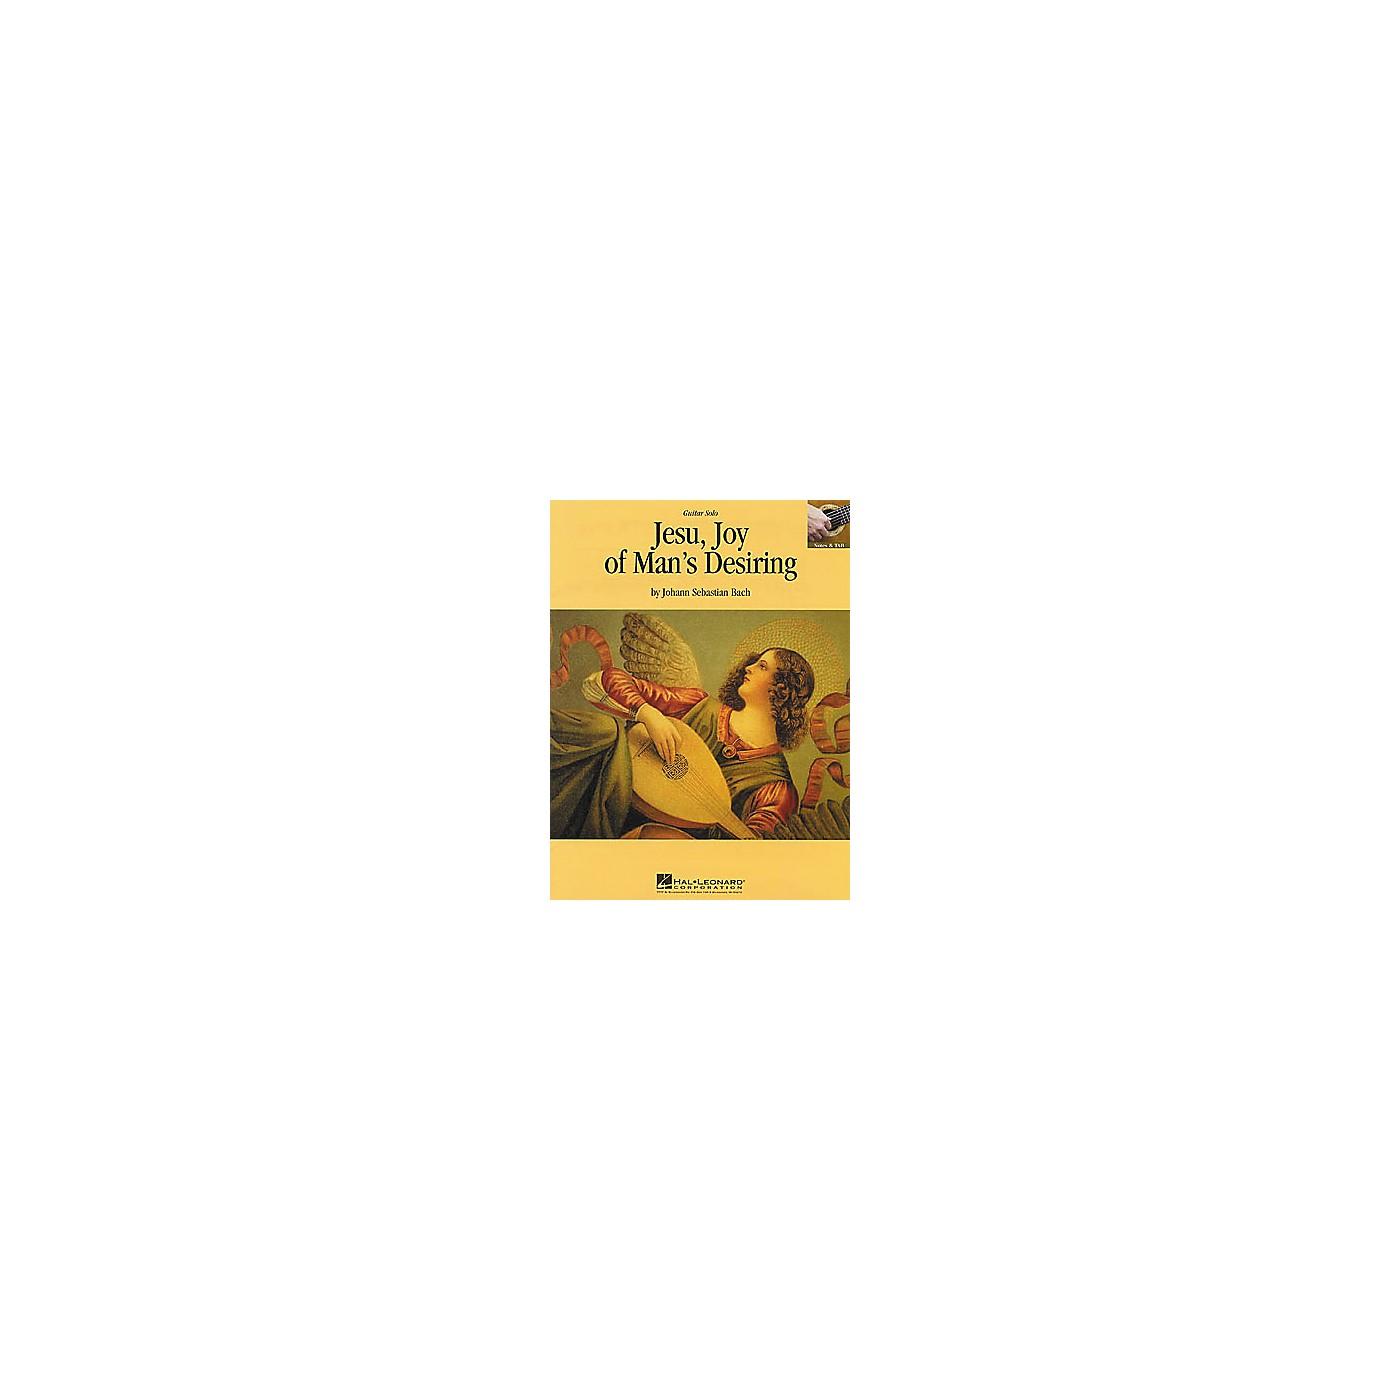 Hal Leonard Bach: Jesu, Joy of Man's Desiring Guitar Sheet Music Book thumbnail